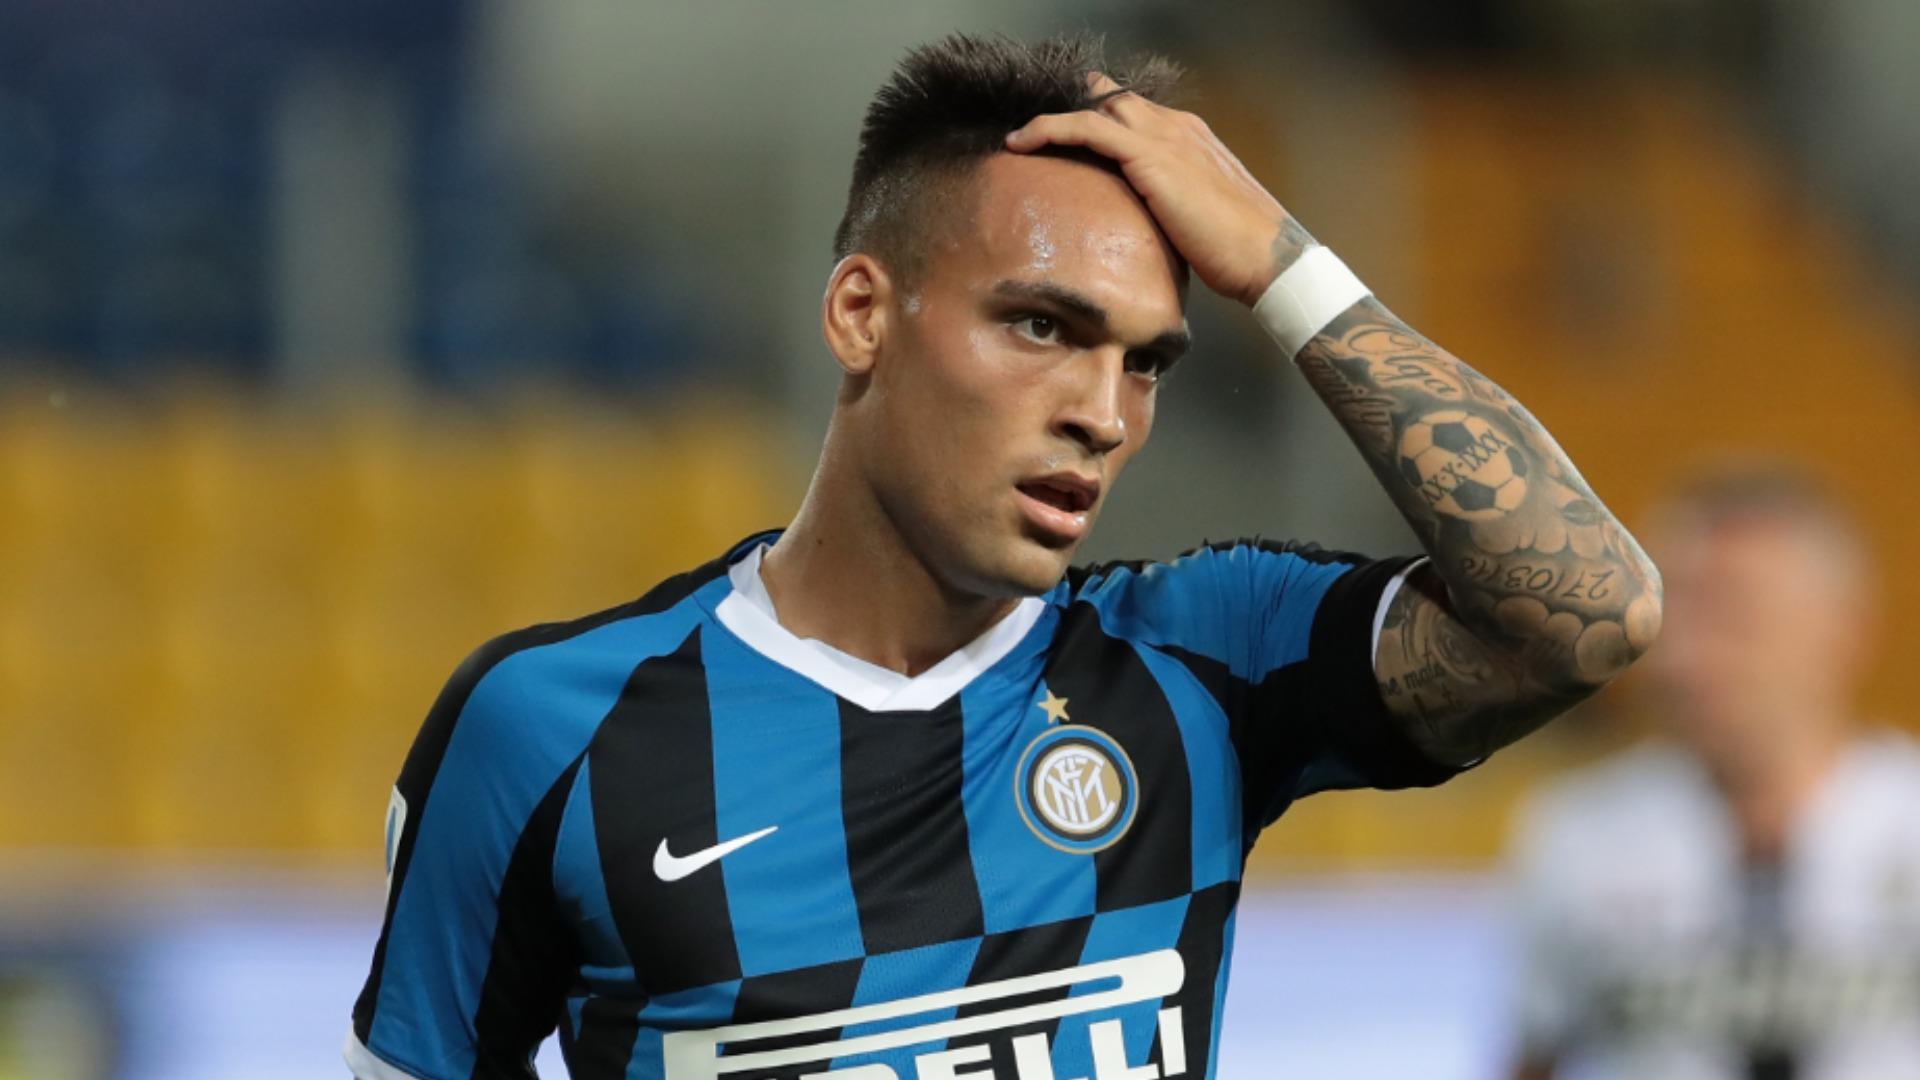 Lautaro Martinez 'must find peace of mind' amid Barca links – Inter CEO Marotta